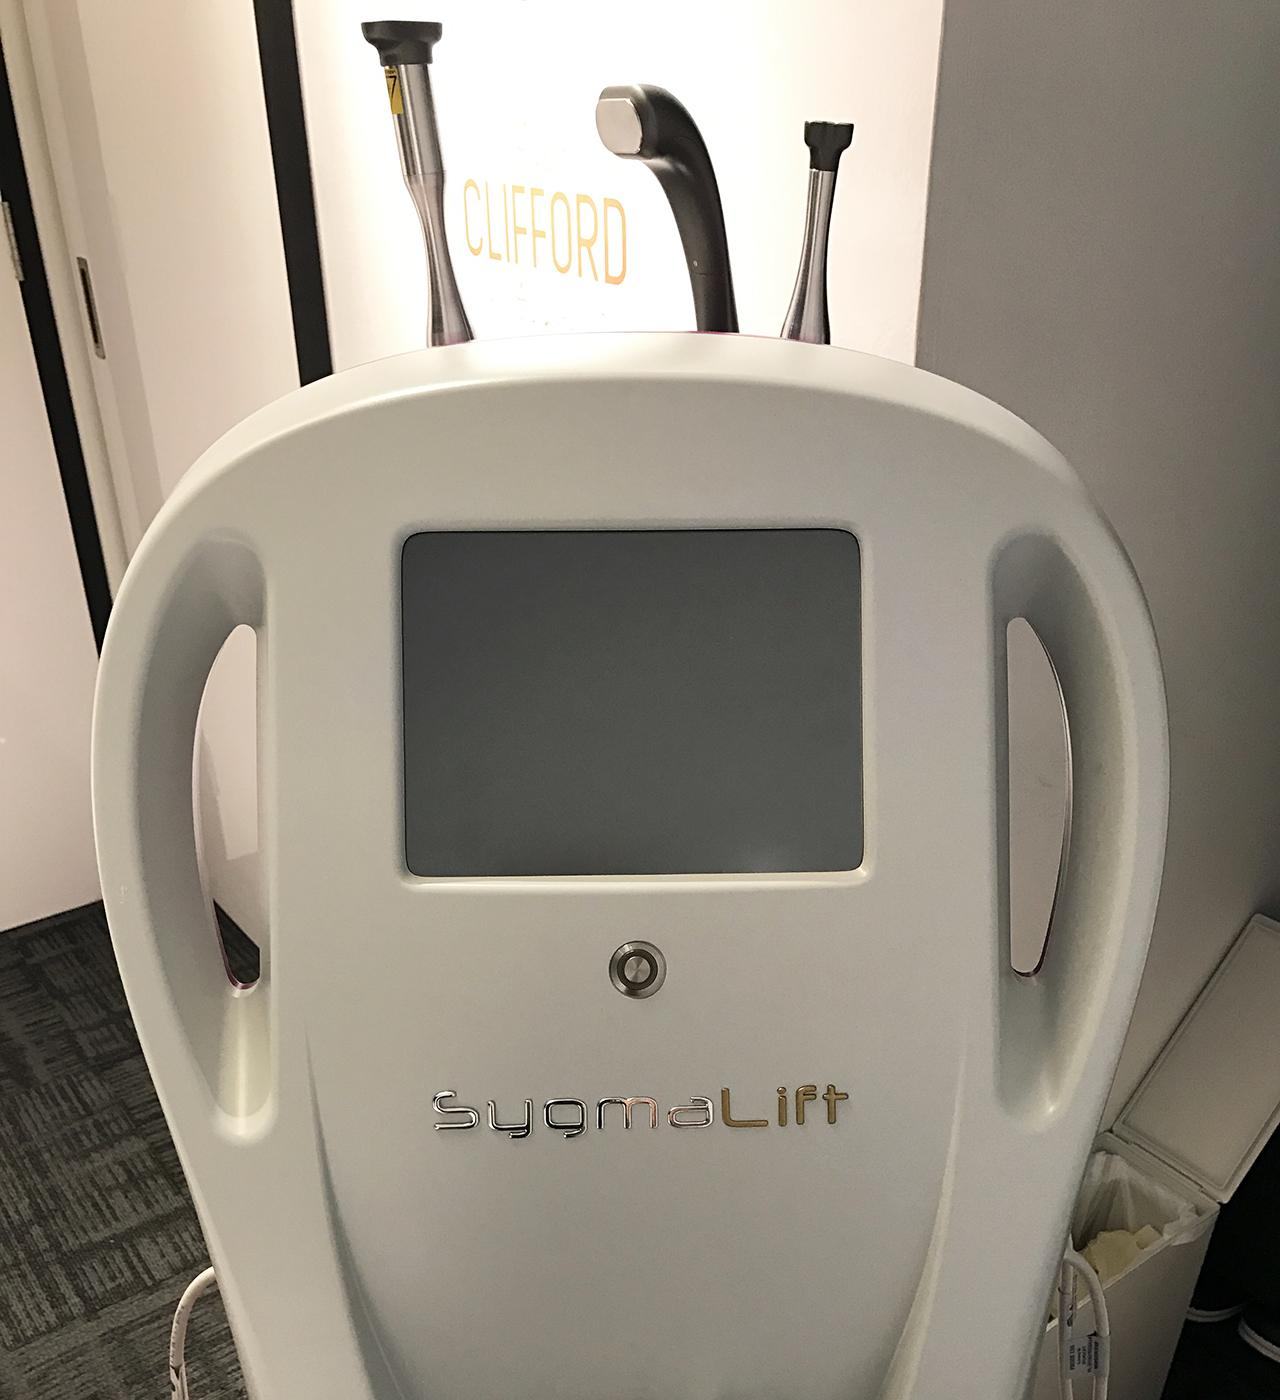 Sygmalift machine